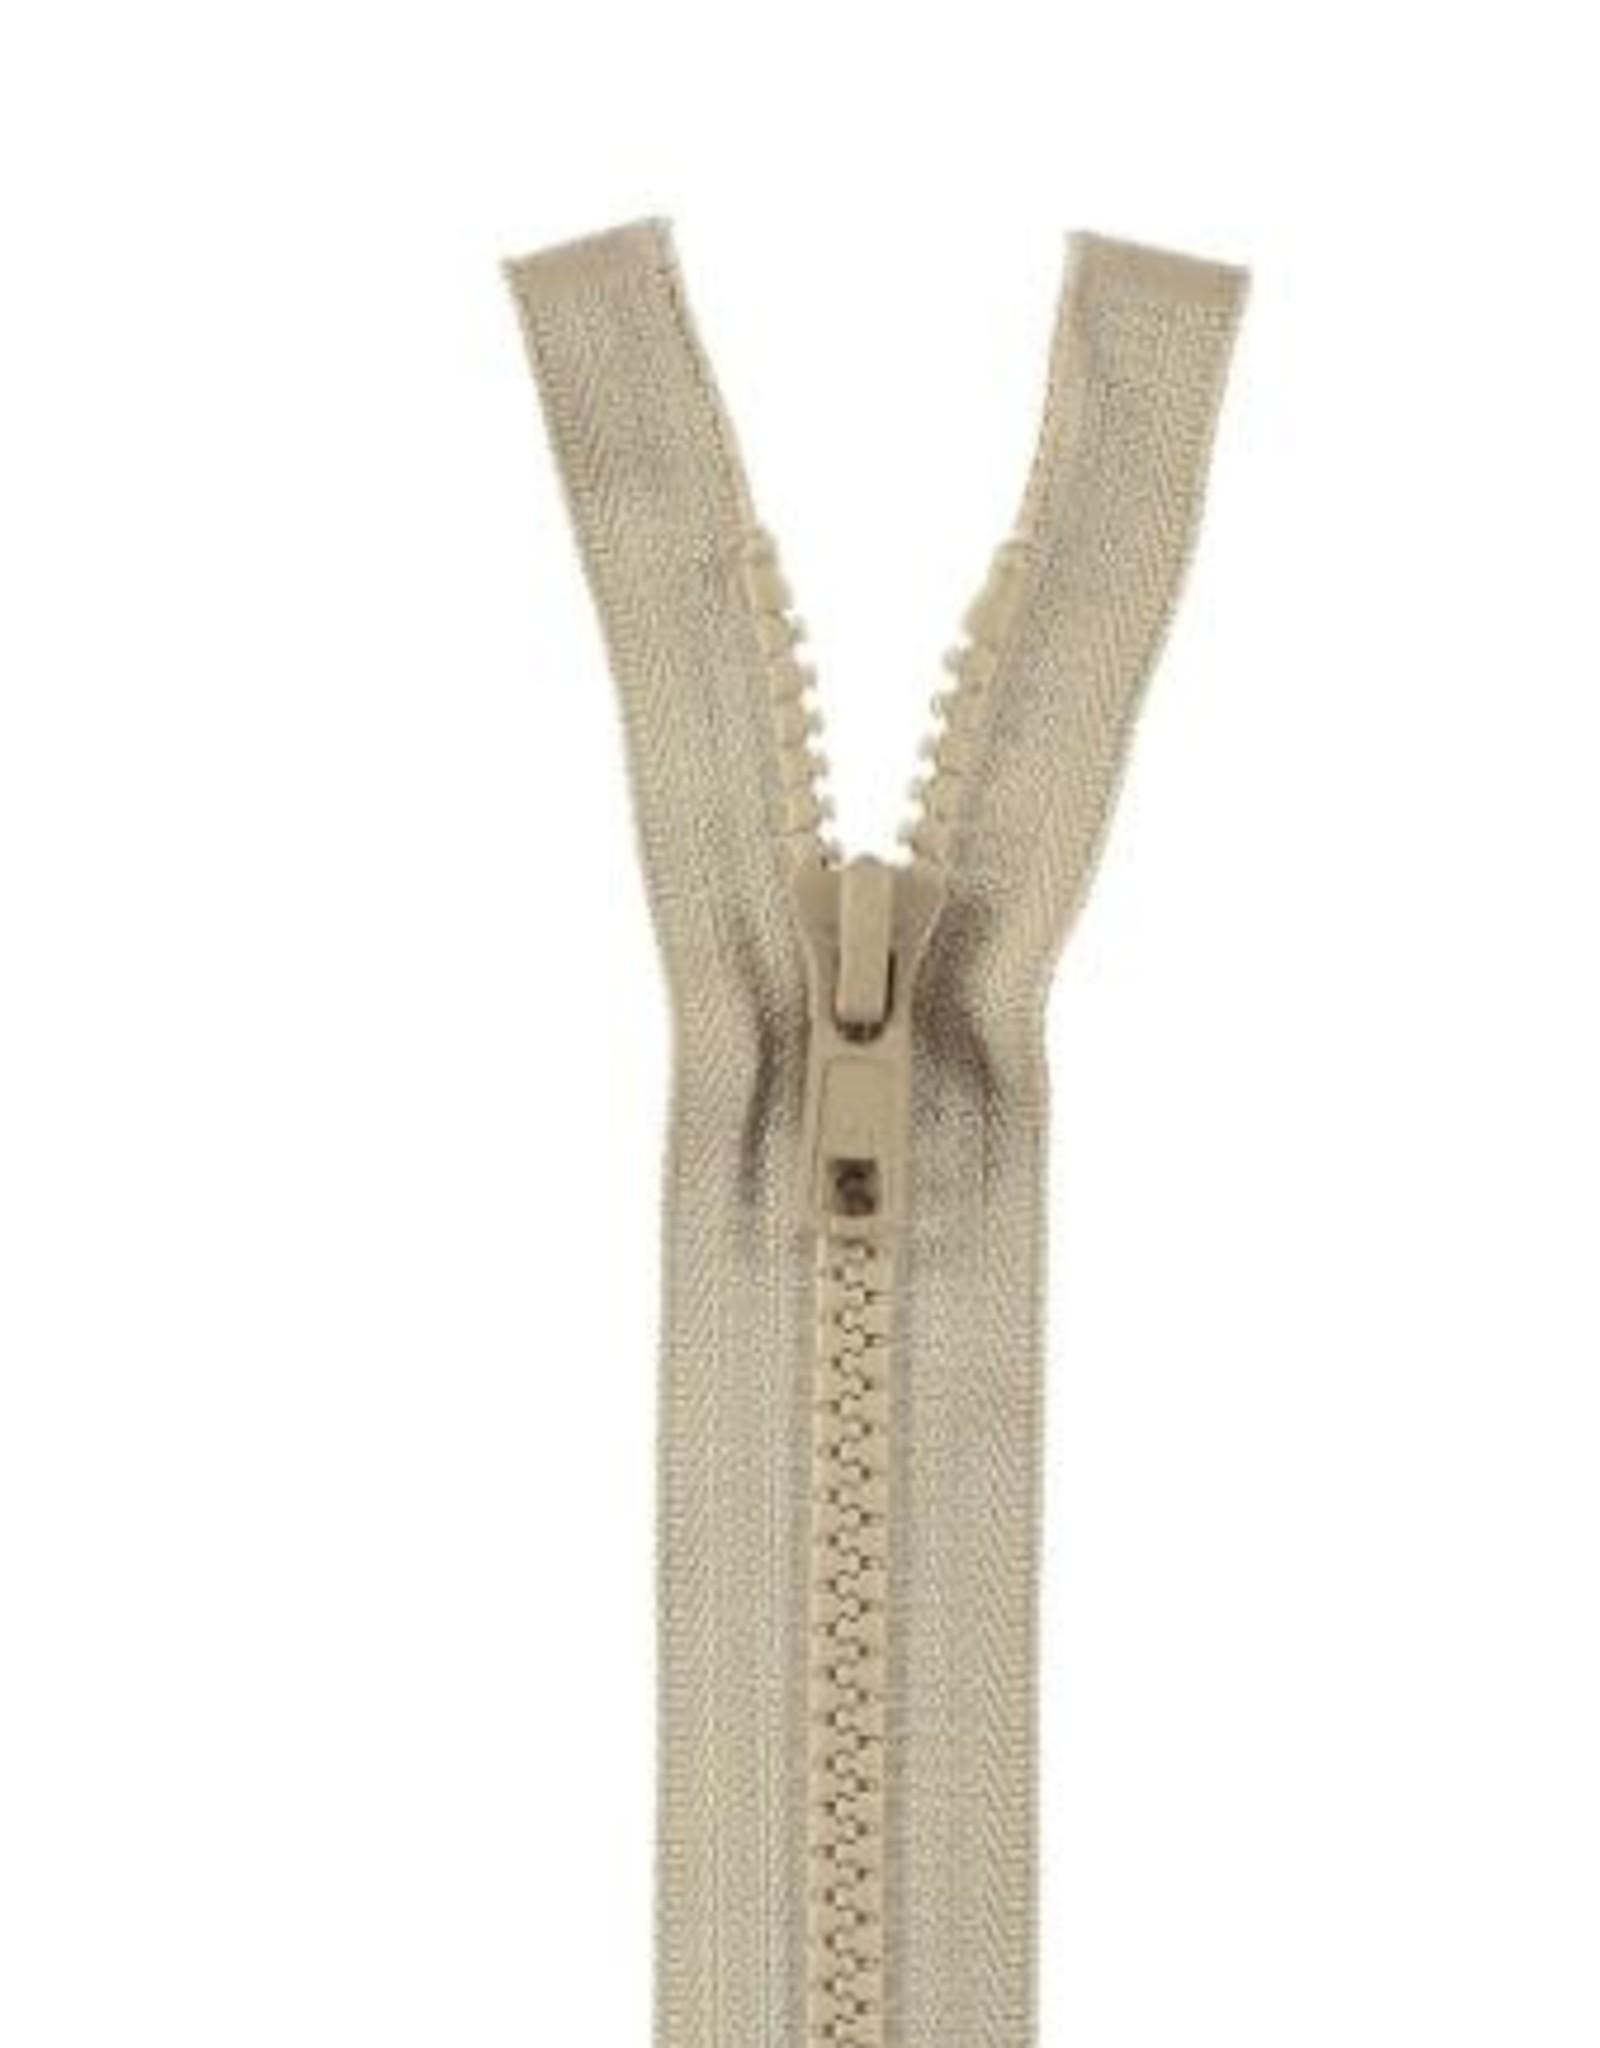 YKK BLOKRITS 5 DEELBAAR beige 573-55cm